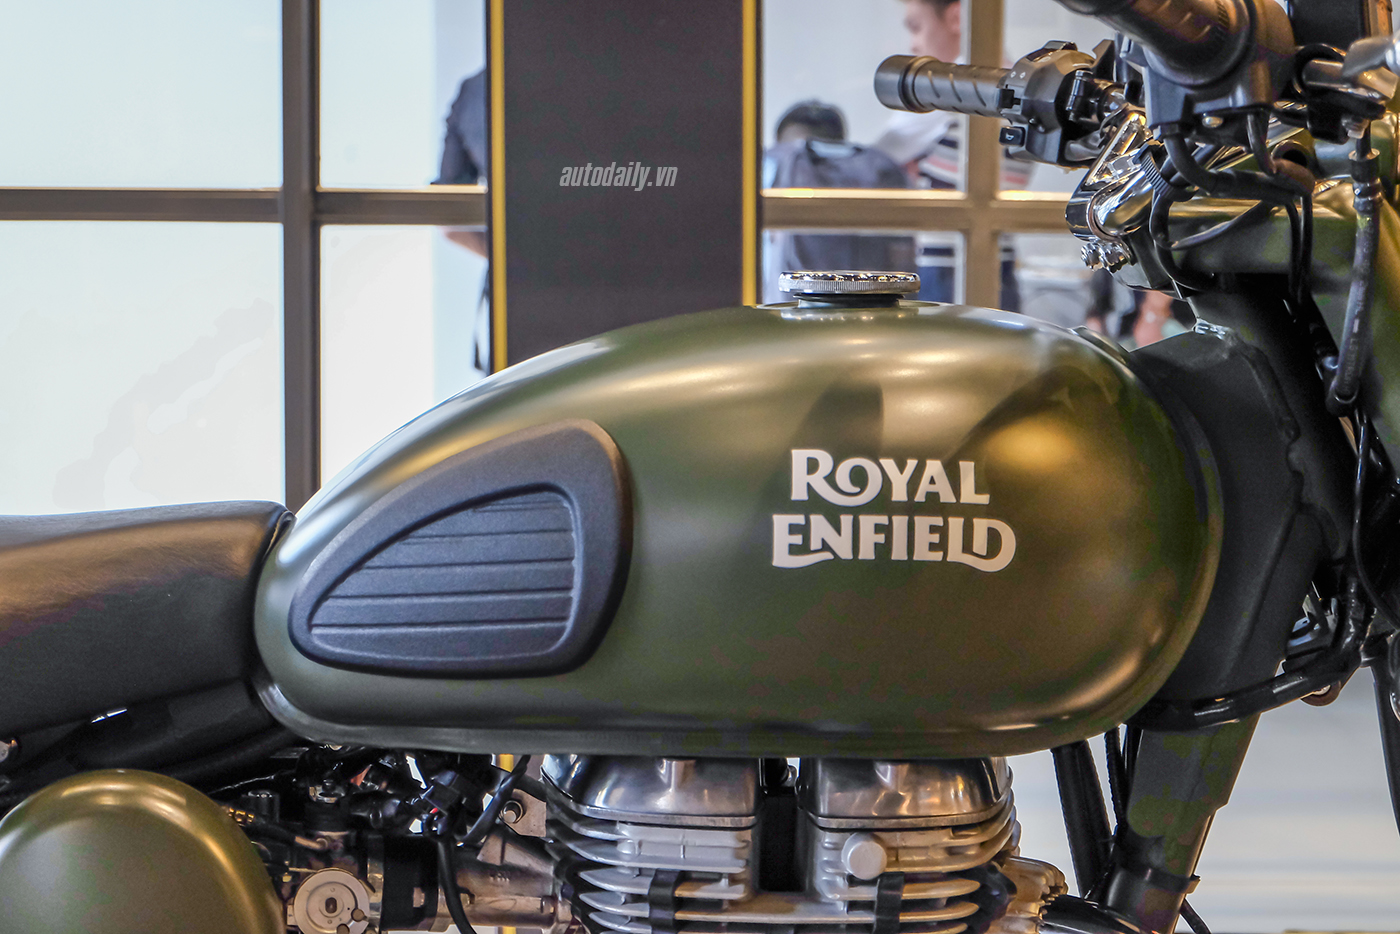 royal-enfield-classic-500-9.jpg